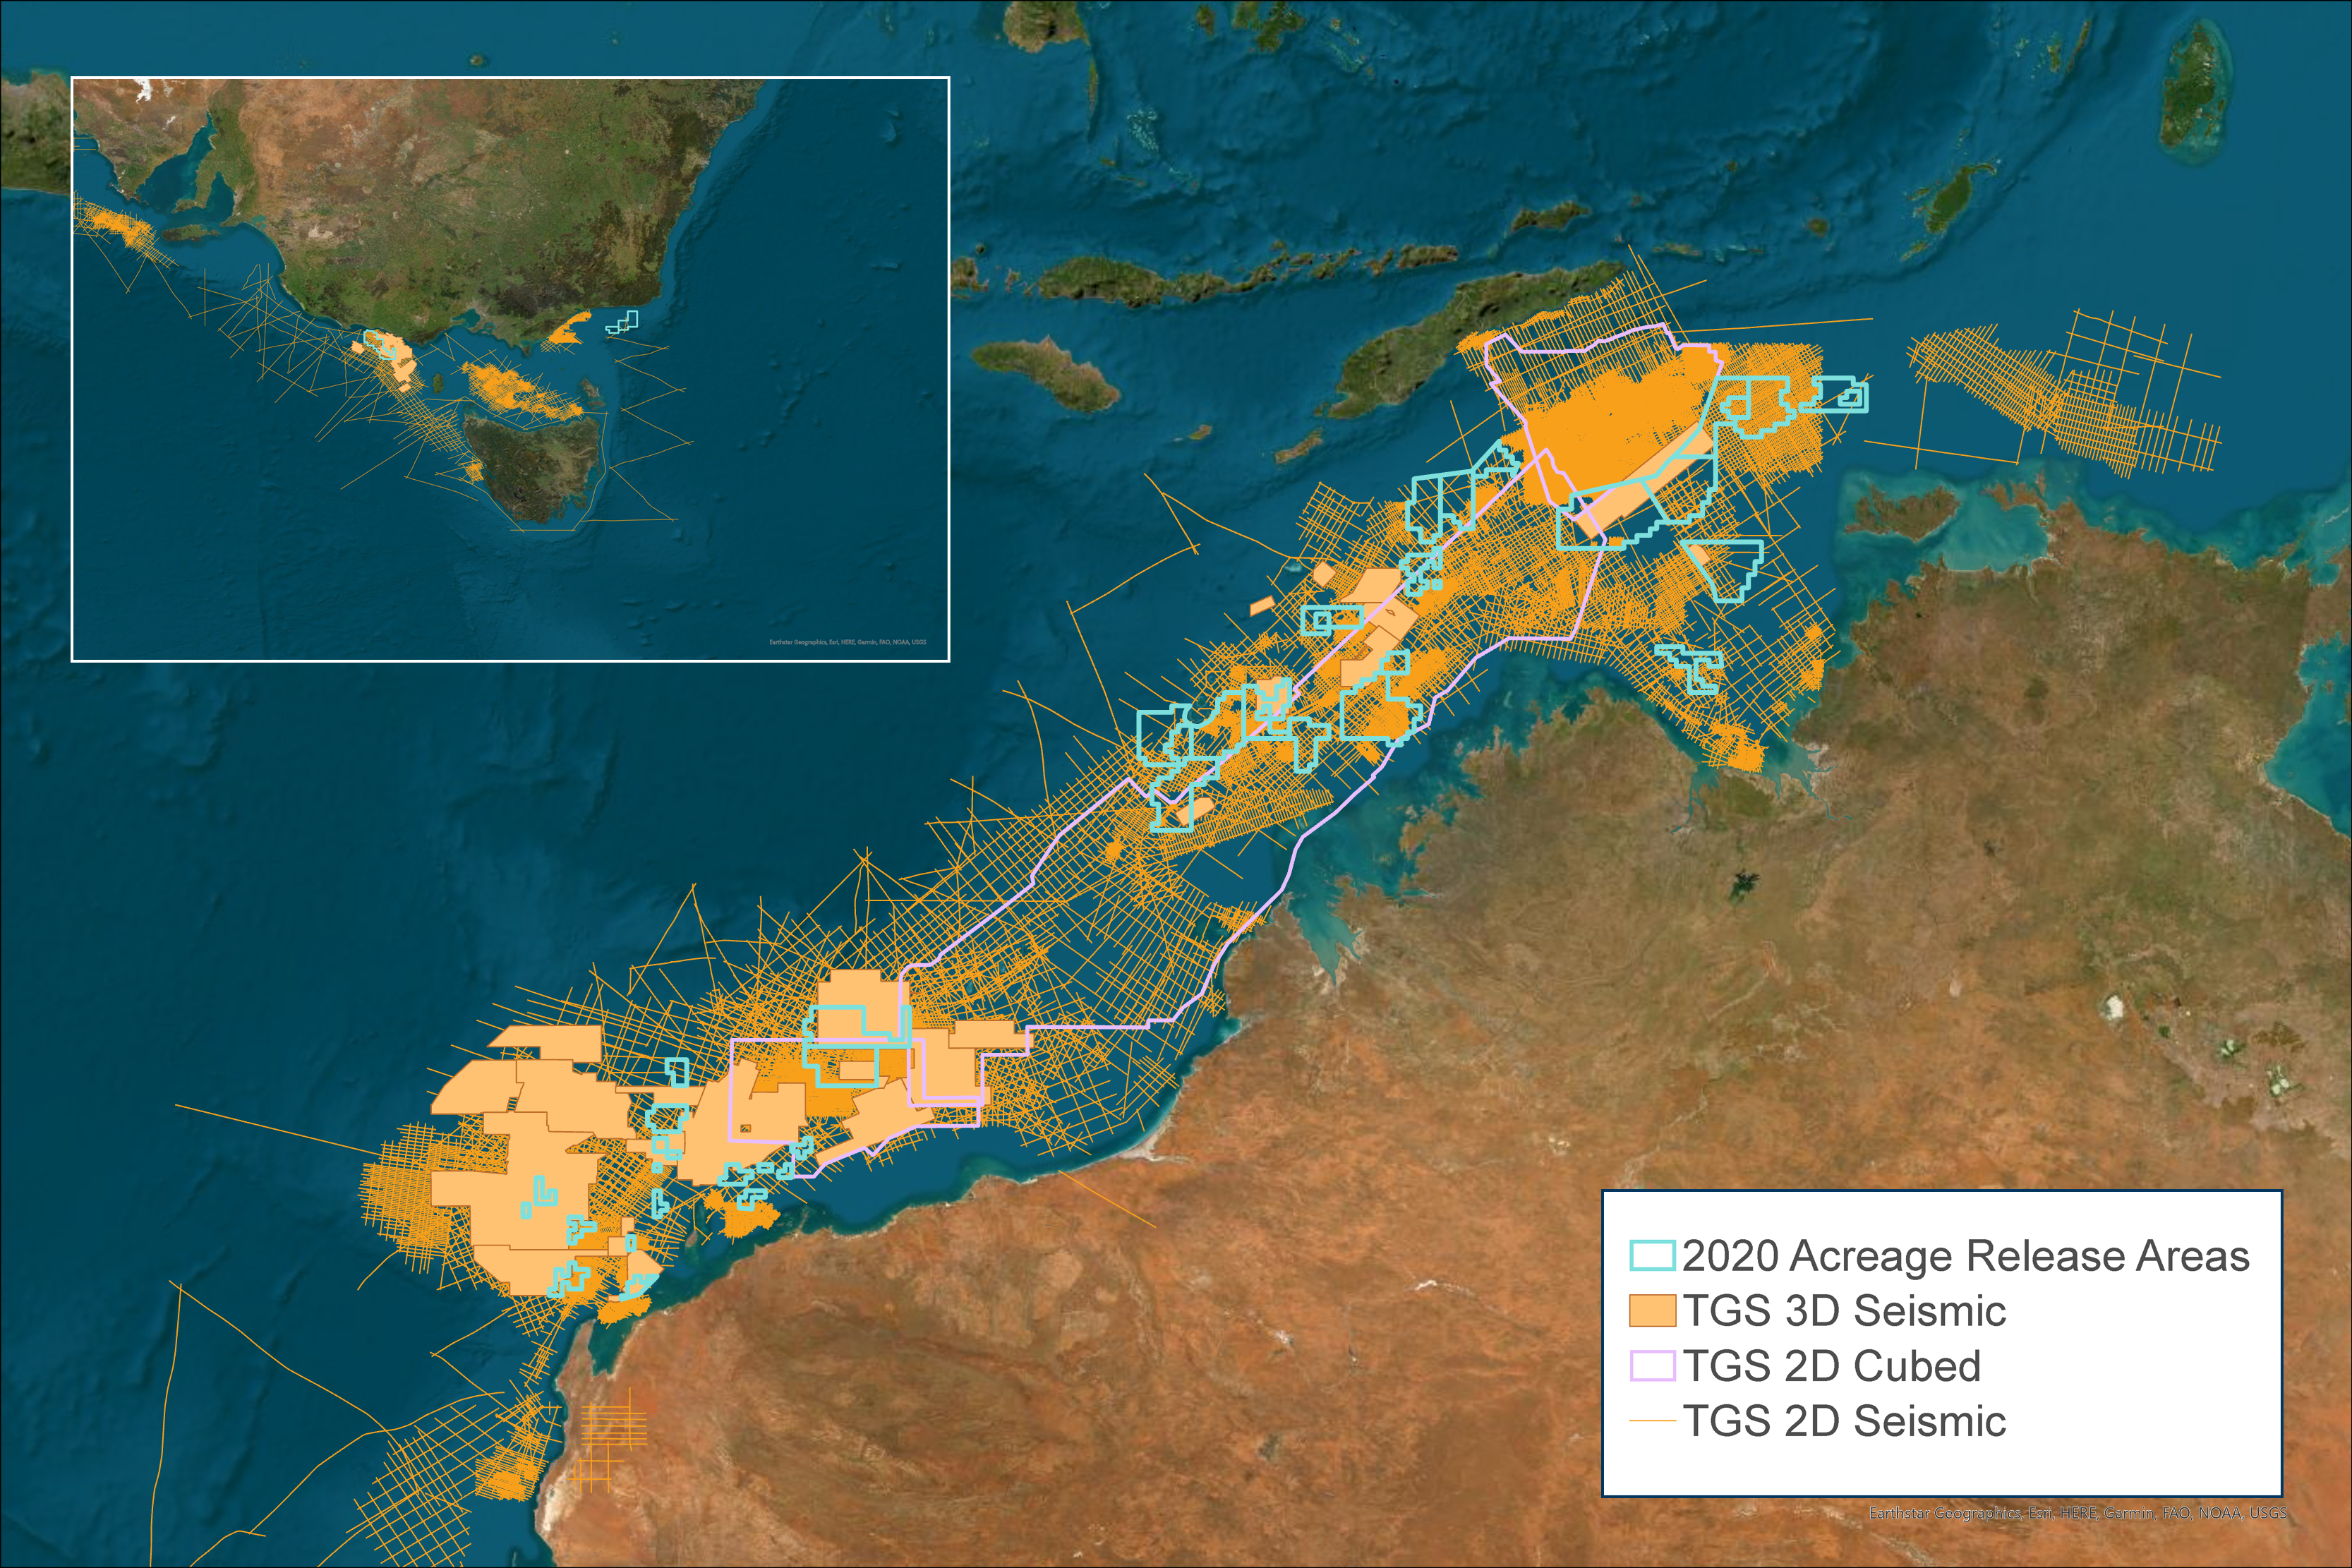 Australian_Offshore_Acreage_ReleaseAreas_Main-COMBINED